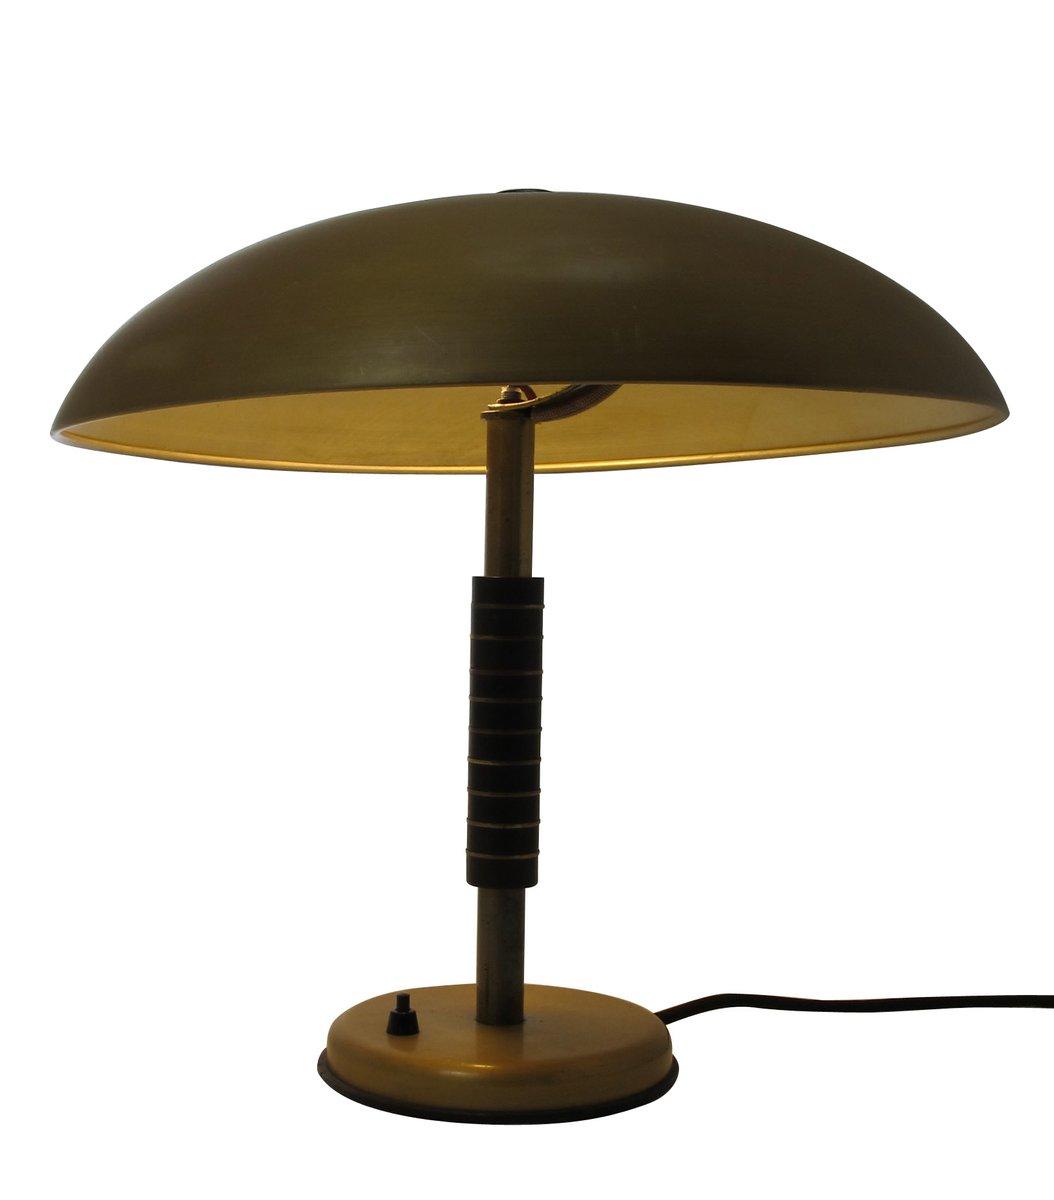 German Art Deco Table Lamp By Sbf 1944